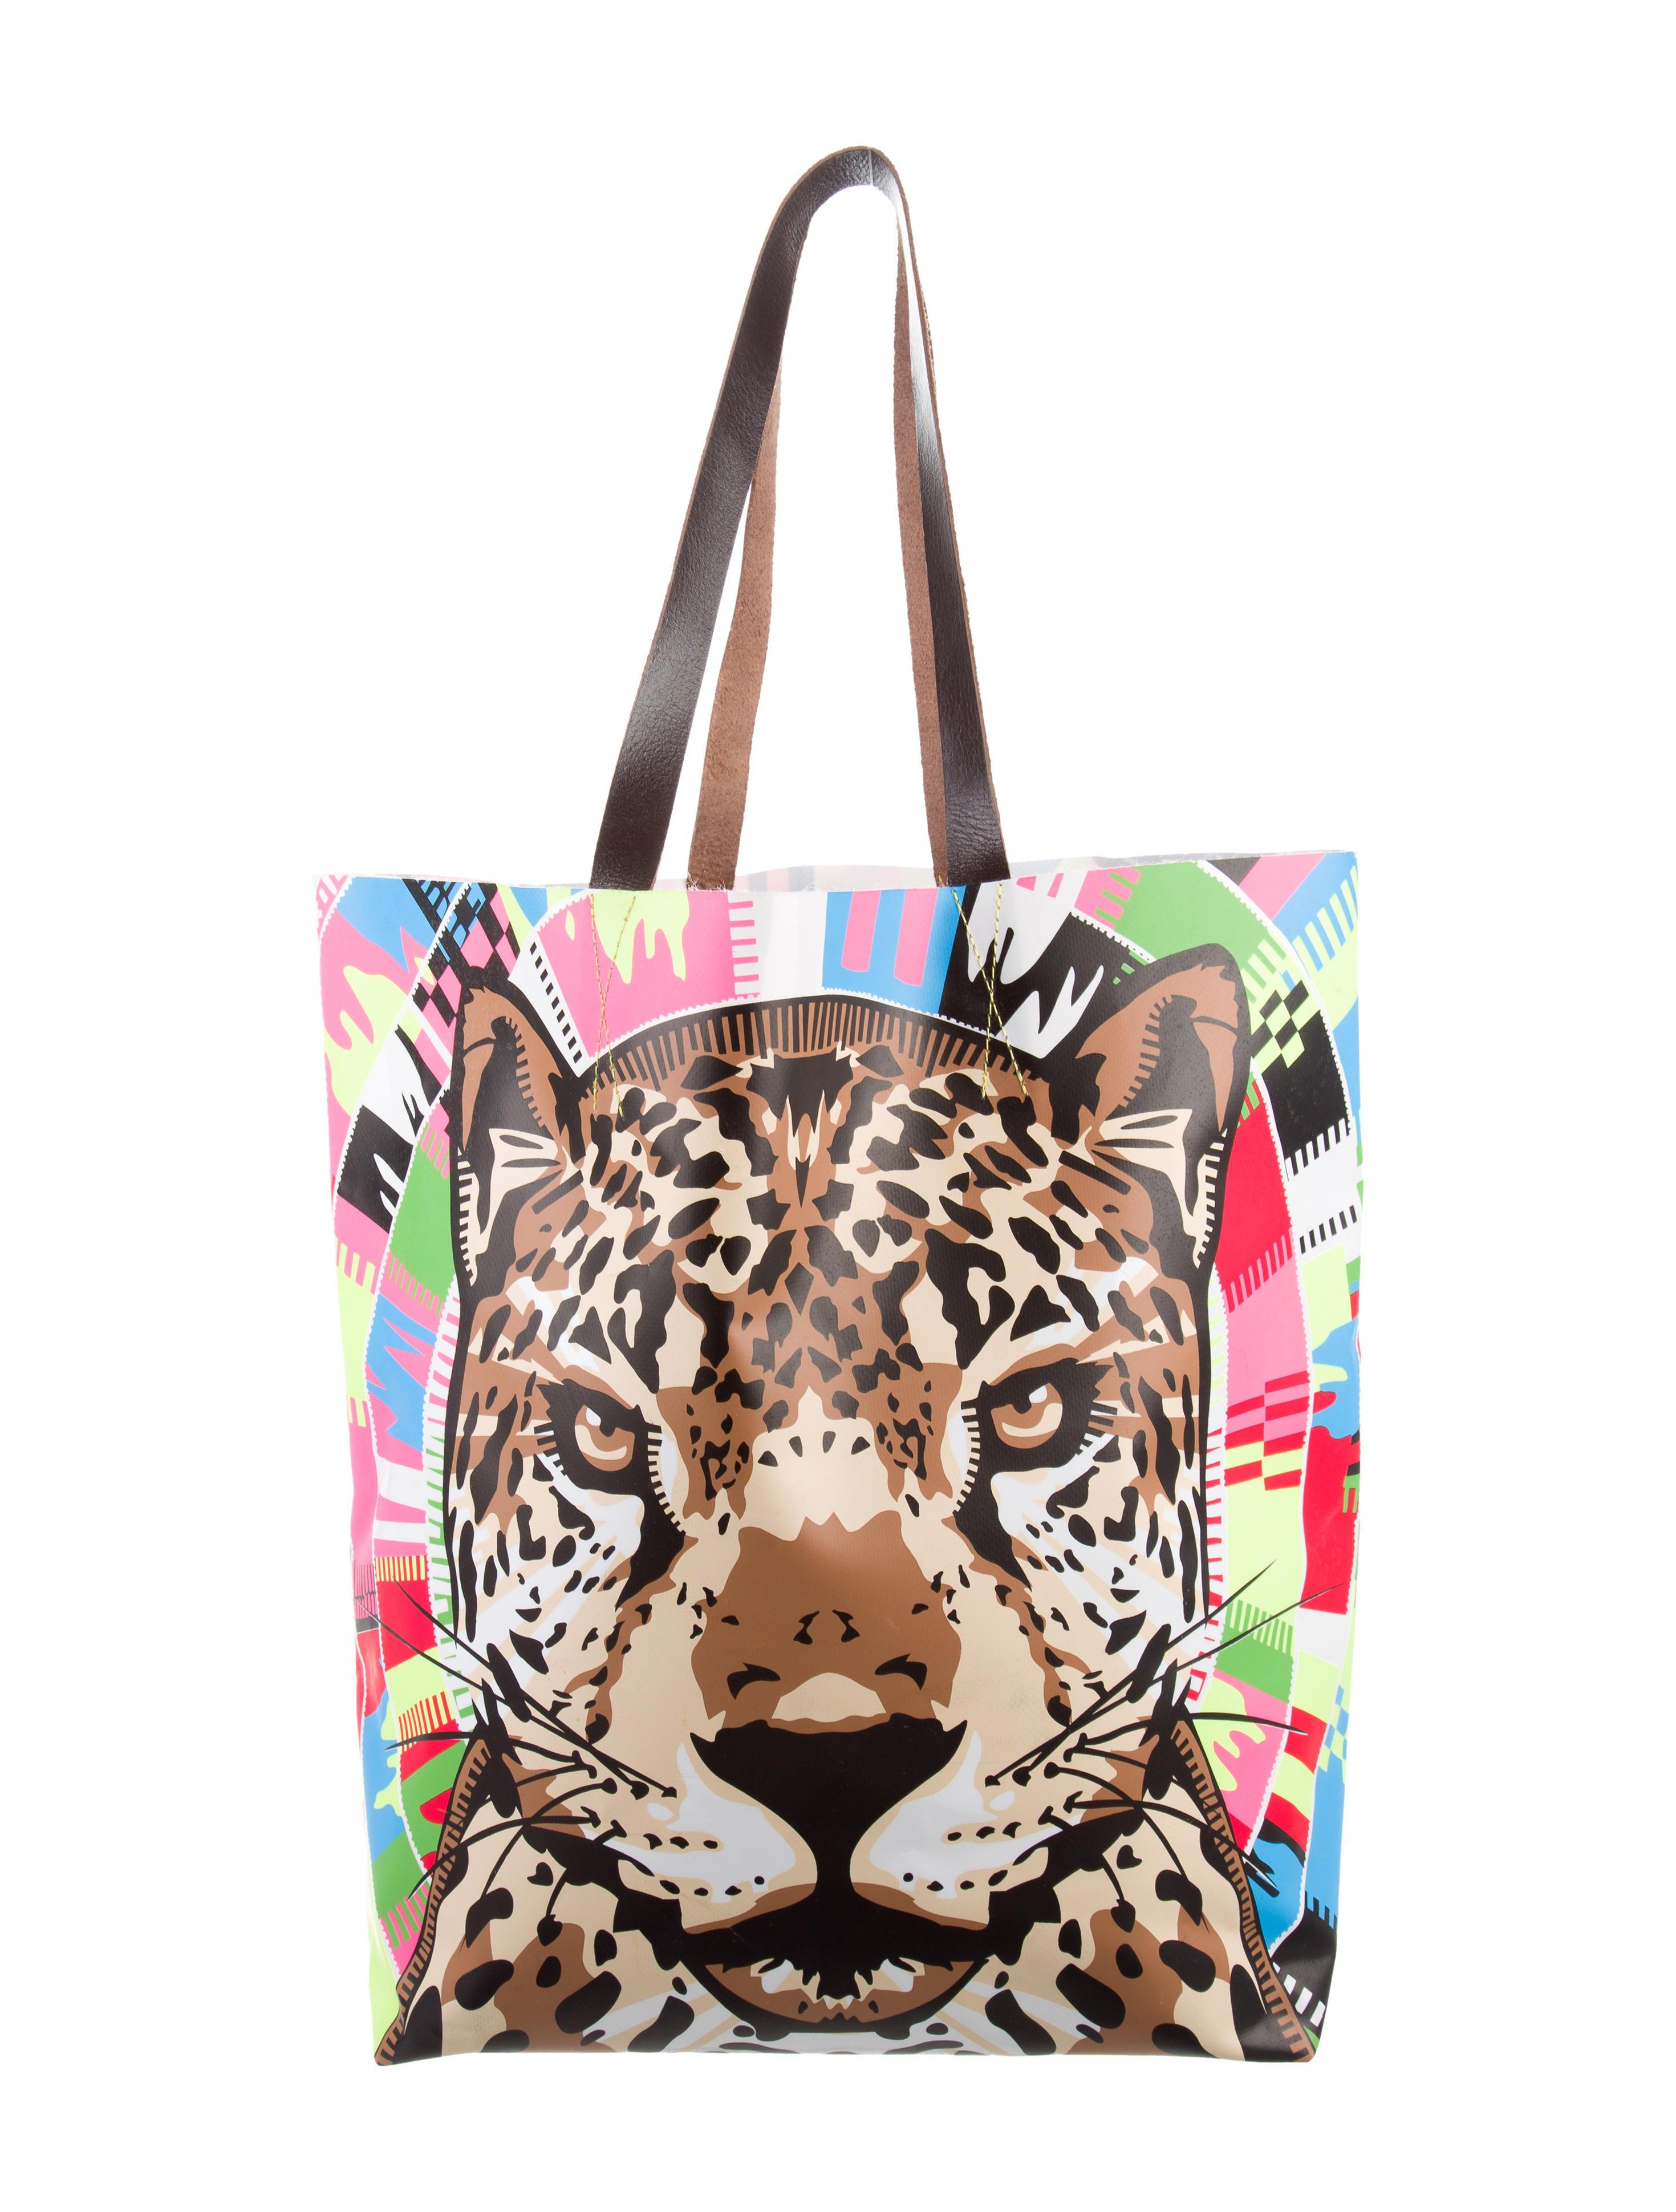 handbags signature i in convertible coach outline celeste jaguar cross body bag hobo